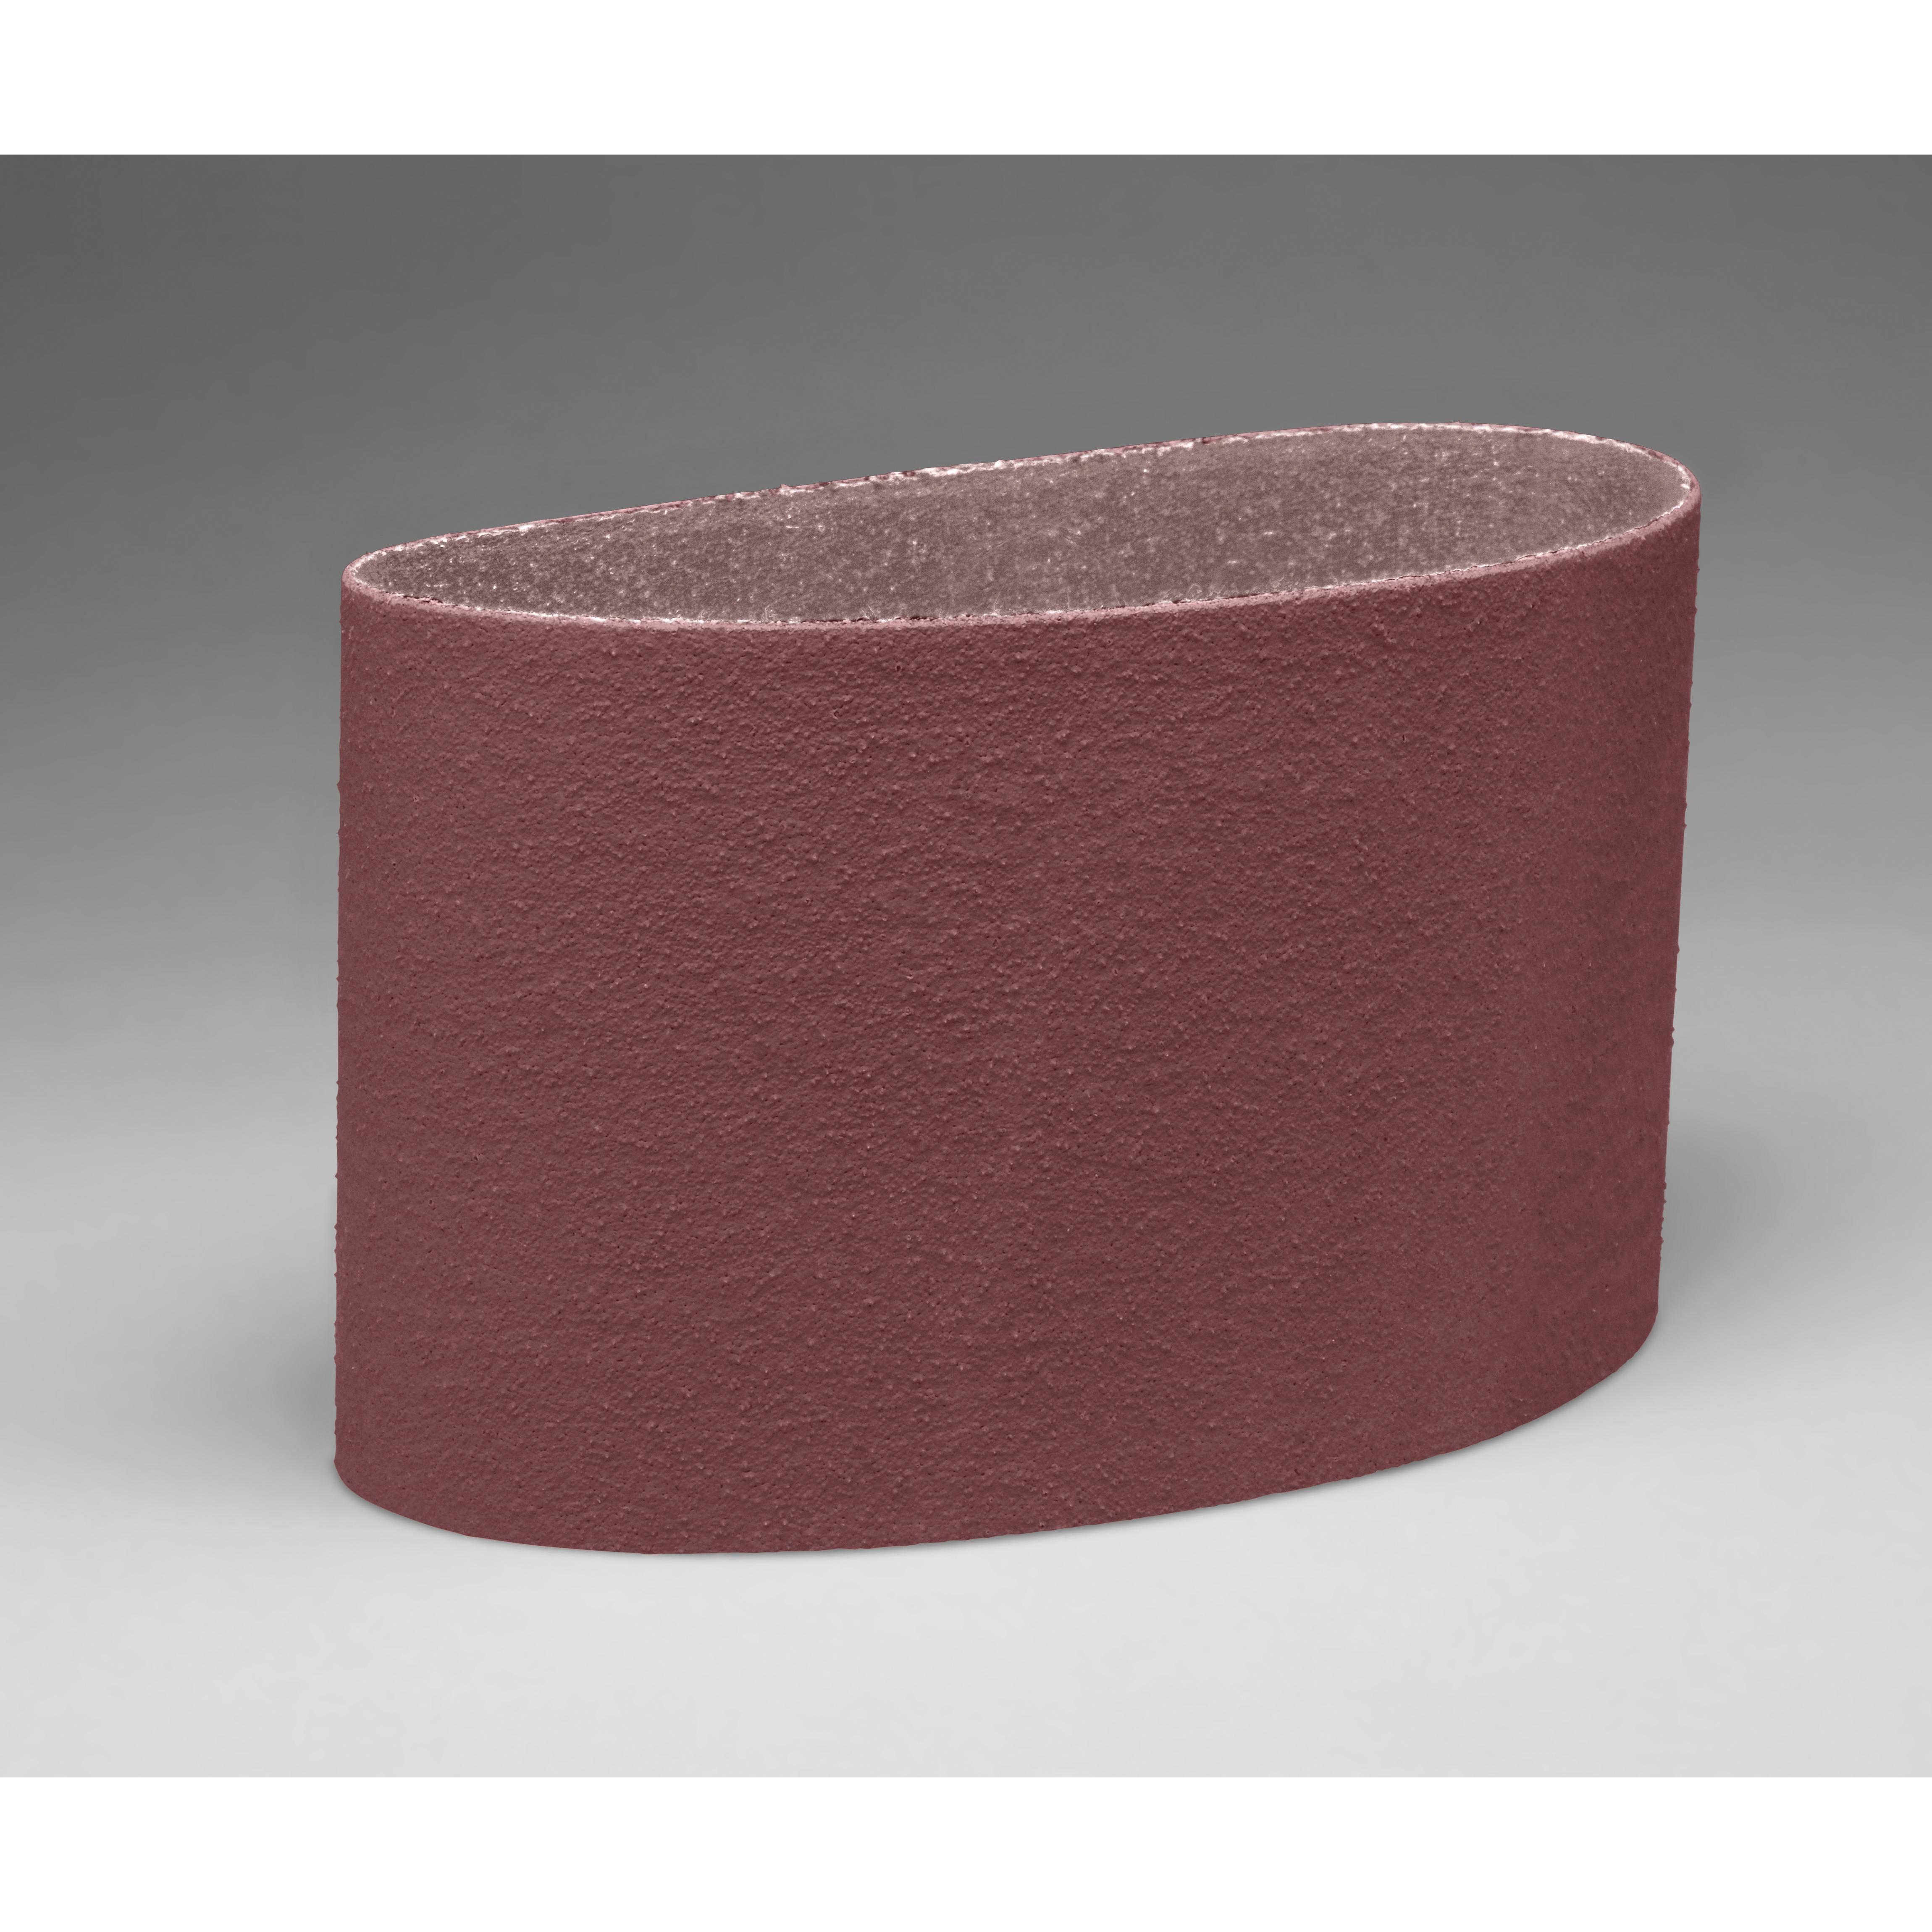 3M™ 051111-66965 341D Narrow Abrasive Belt, 8 in W x 94-1/2 in L, 60 Grit, Medium Grade, Aluminum Oxide Abrasive, Cloth Backing